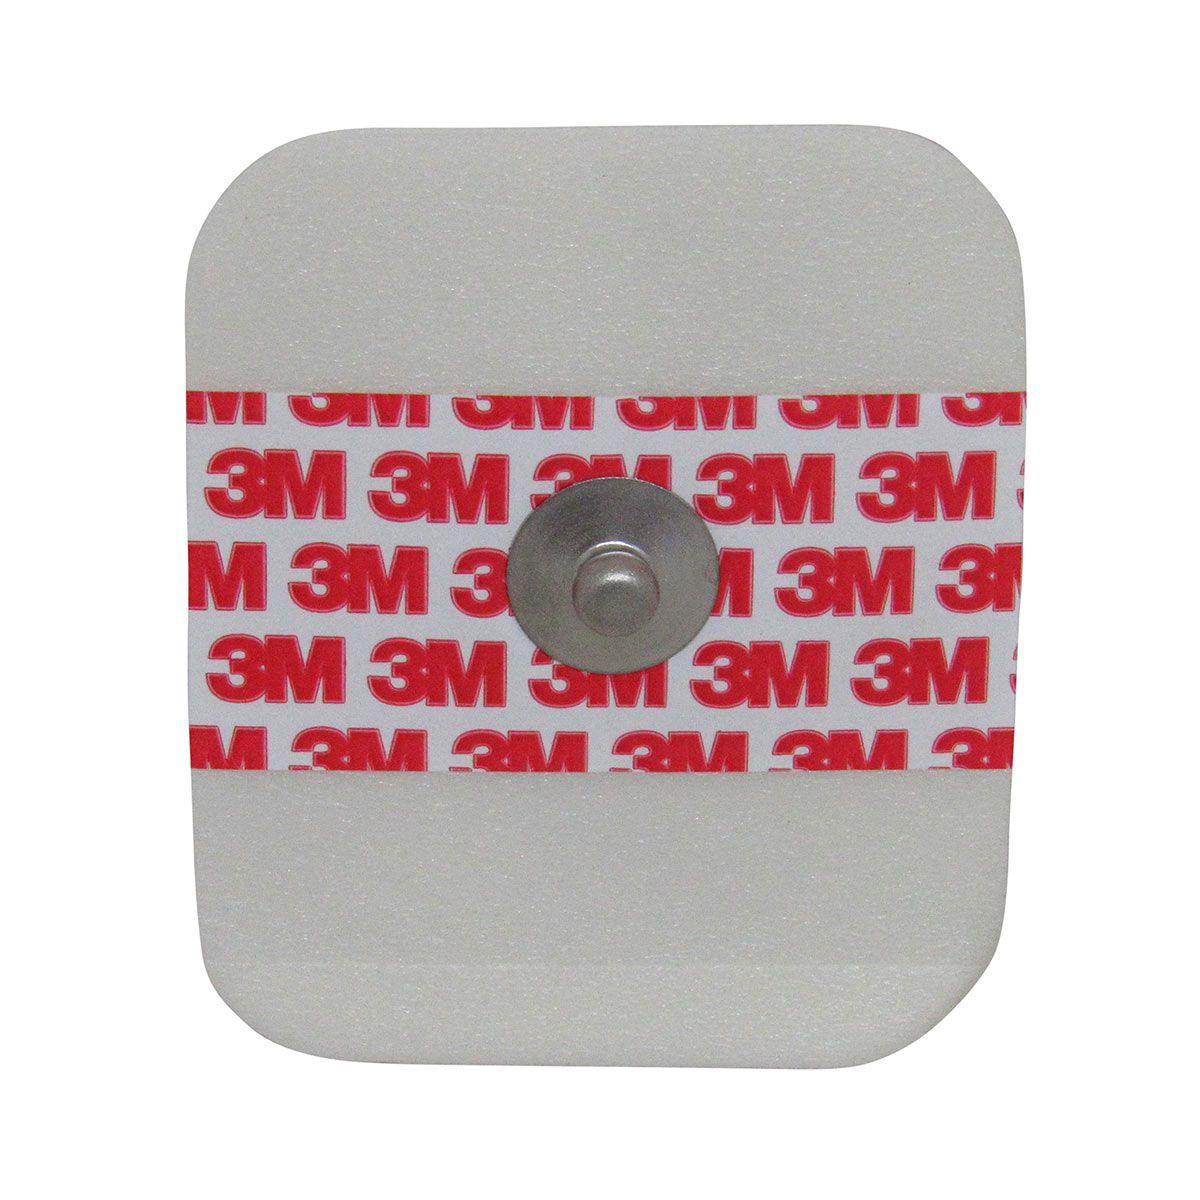 Eletrodo Monitoração Cardíaca Adulto 50un 3M Kit 6 pacotes